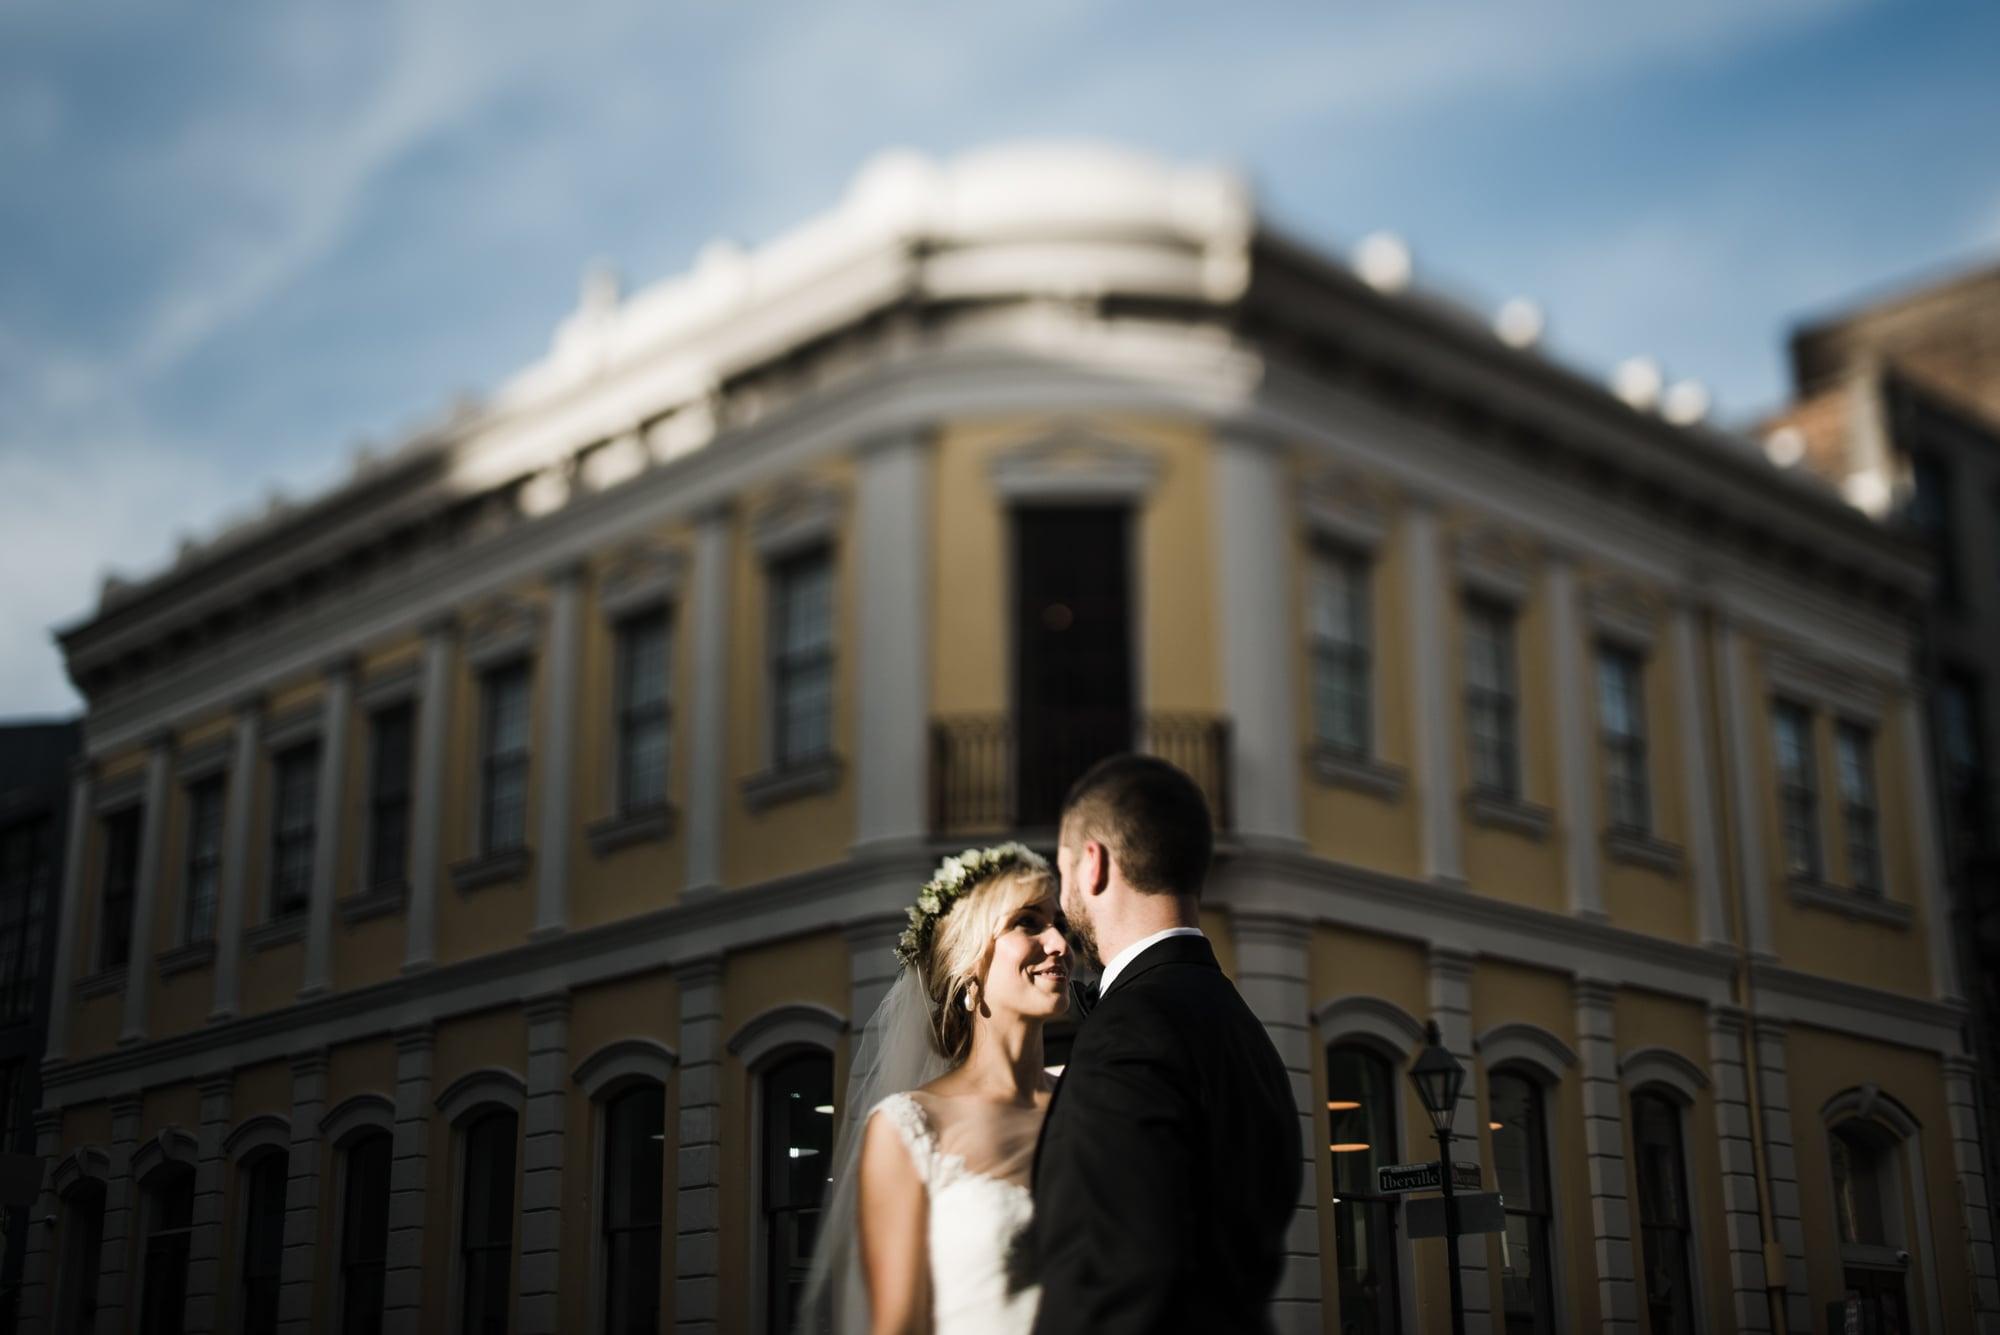 ©Isaiah & Taylor Photography - The Elms Mansion Wedding - New Orleans, Louisiana-53.jpg